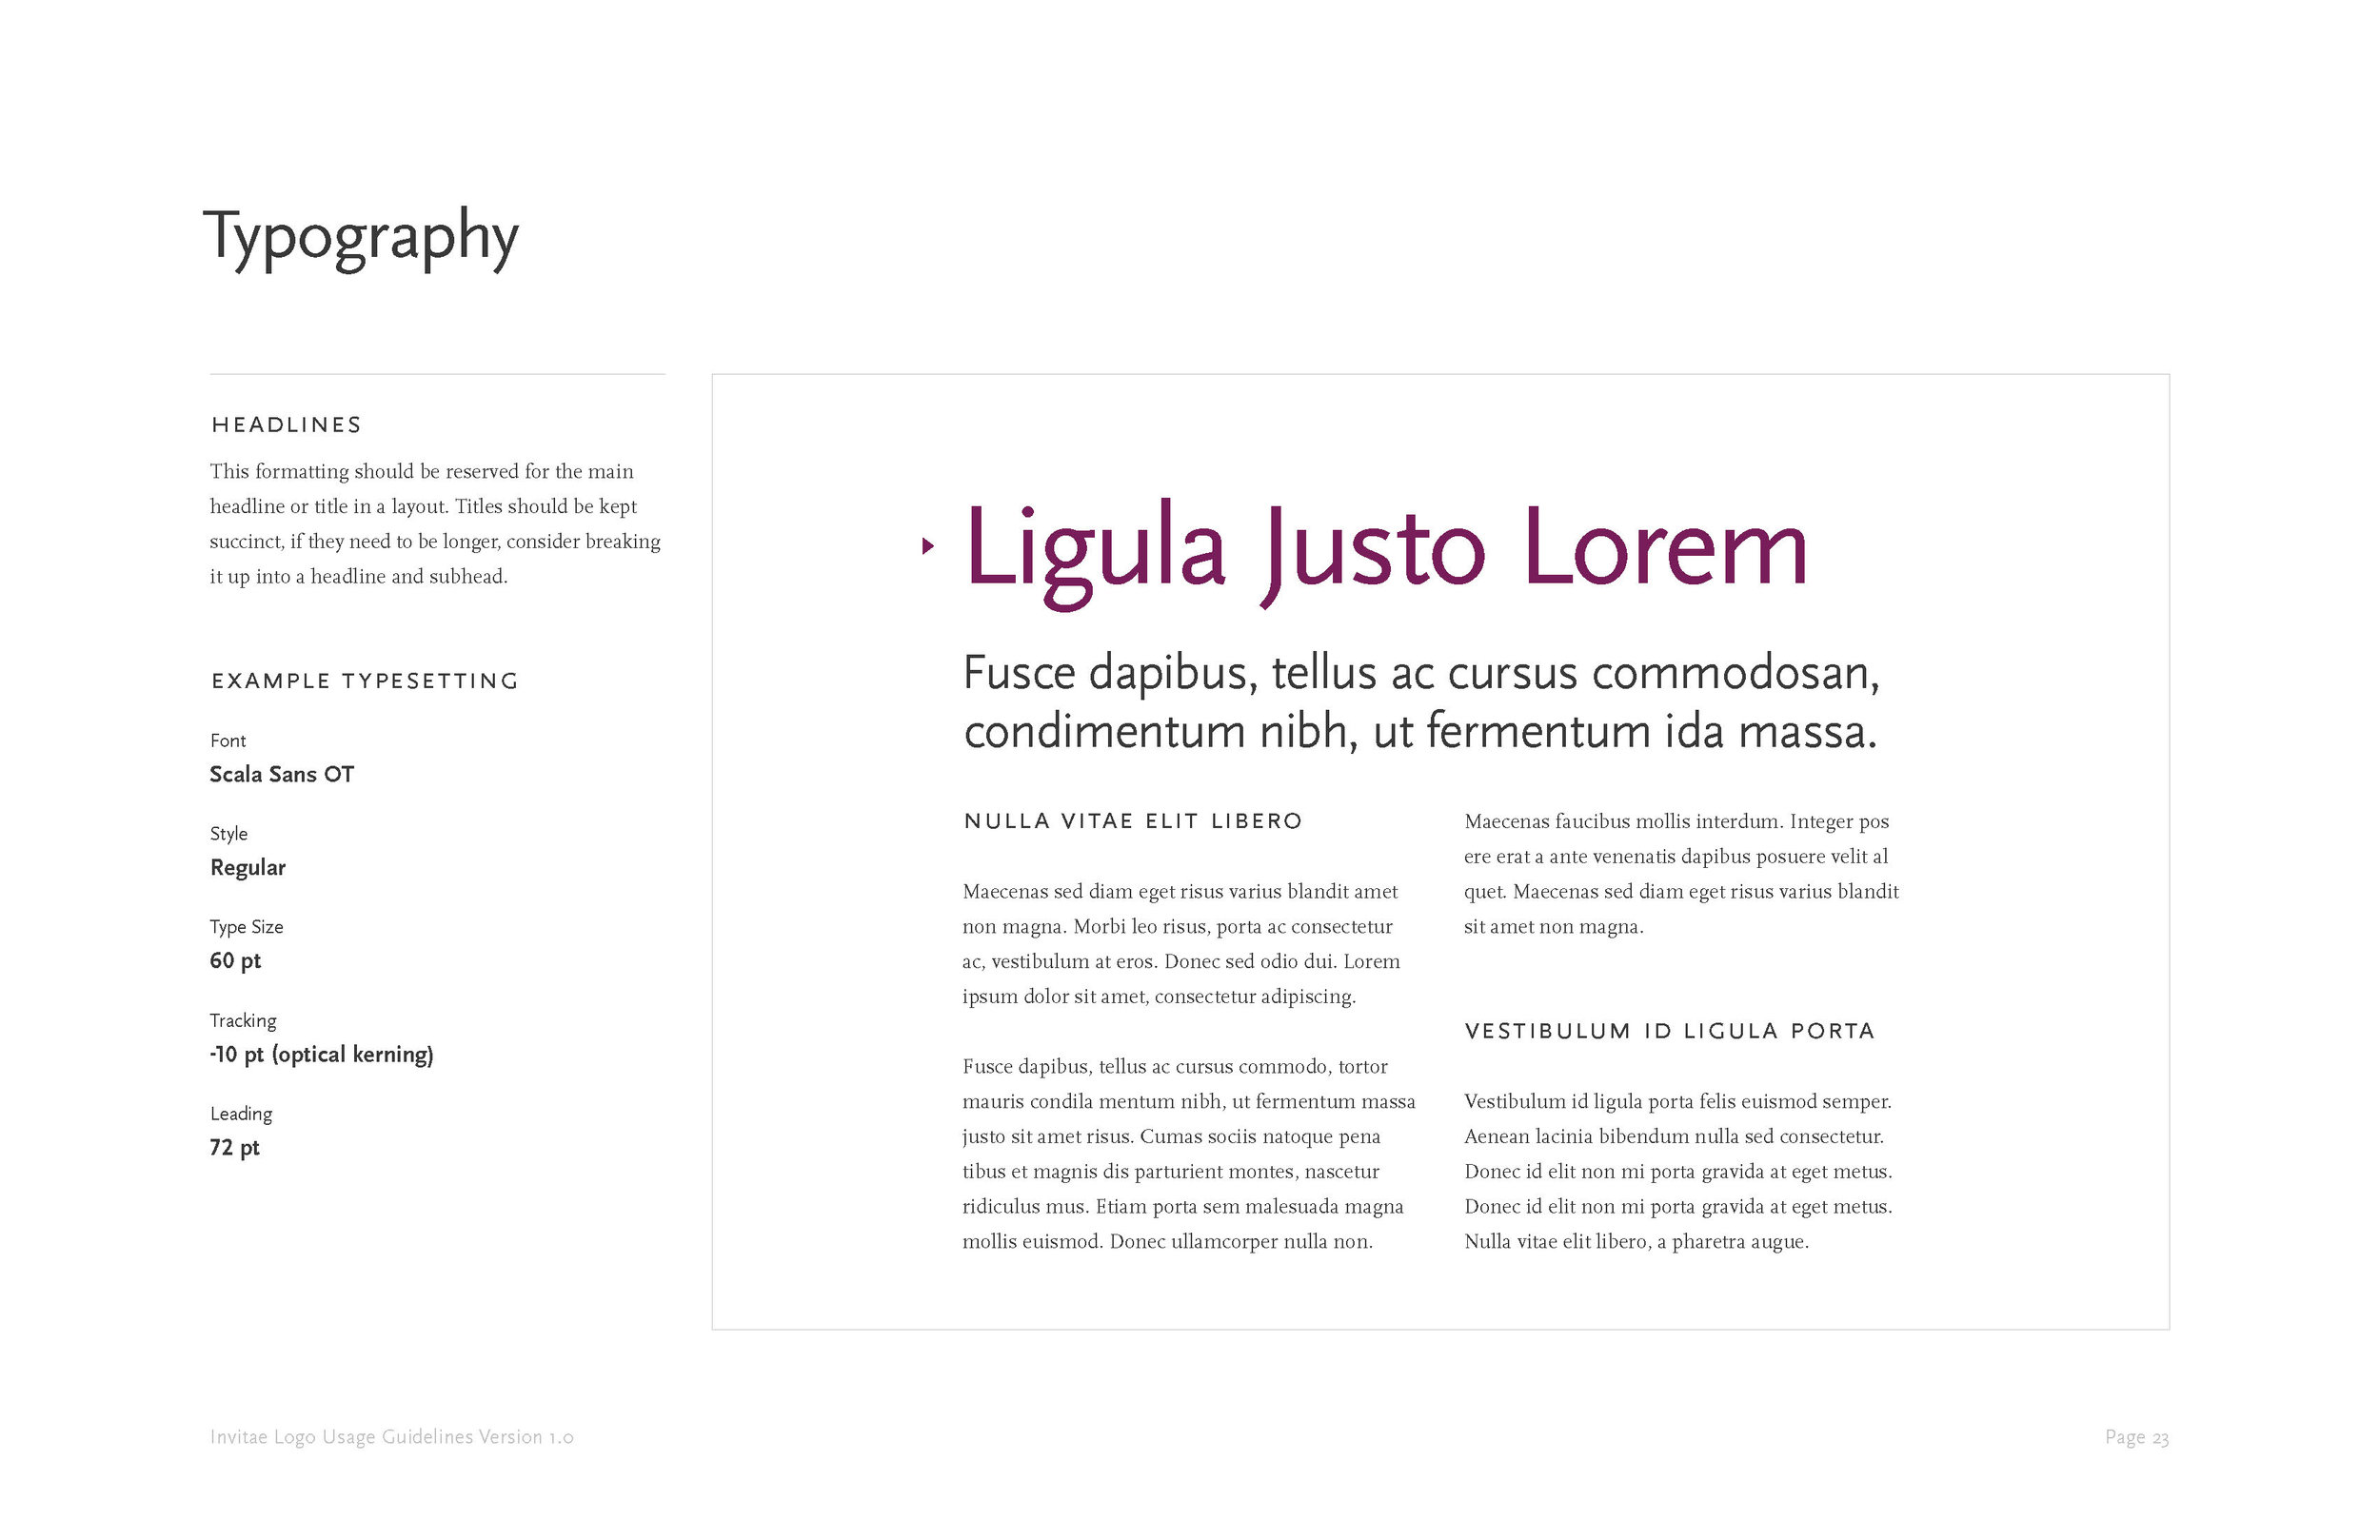 Invitae_logo_guidelines_Page_25.jpg